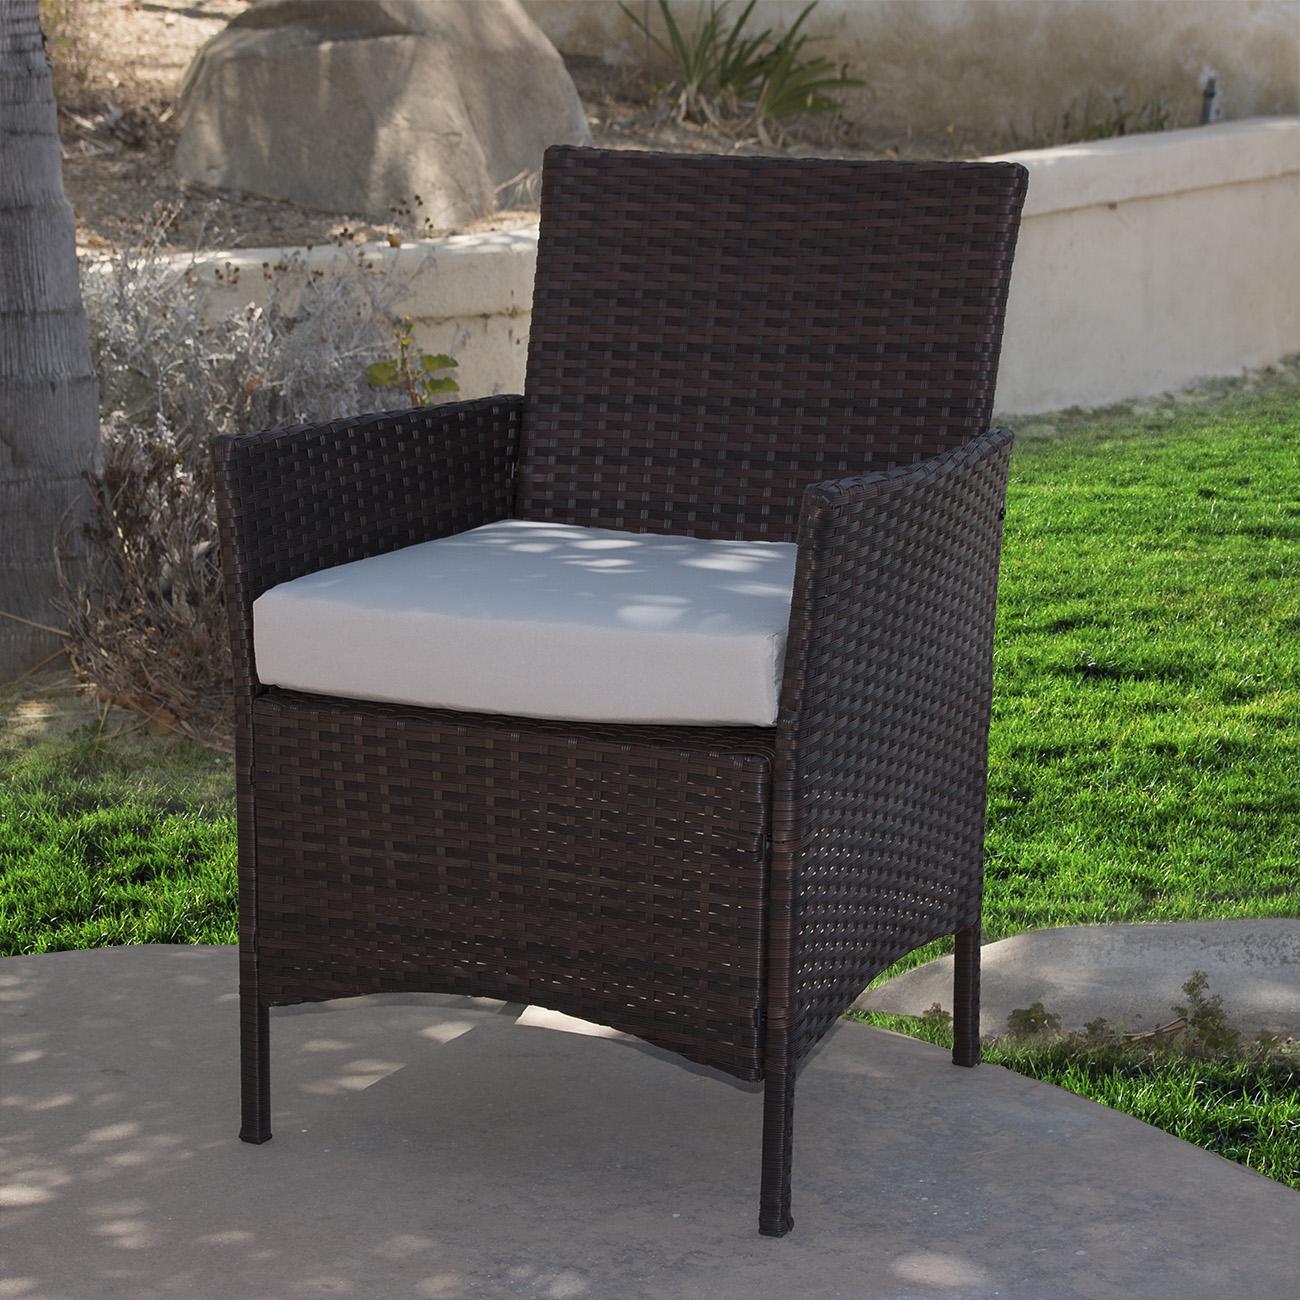 4pcs Outdoor Rattan Wicker Patio Garden Sofa Couch Furniture Set Dark Brown New Ebay